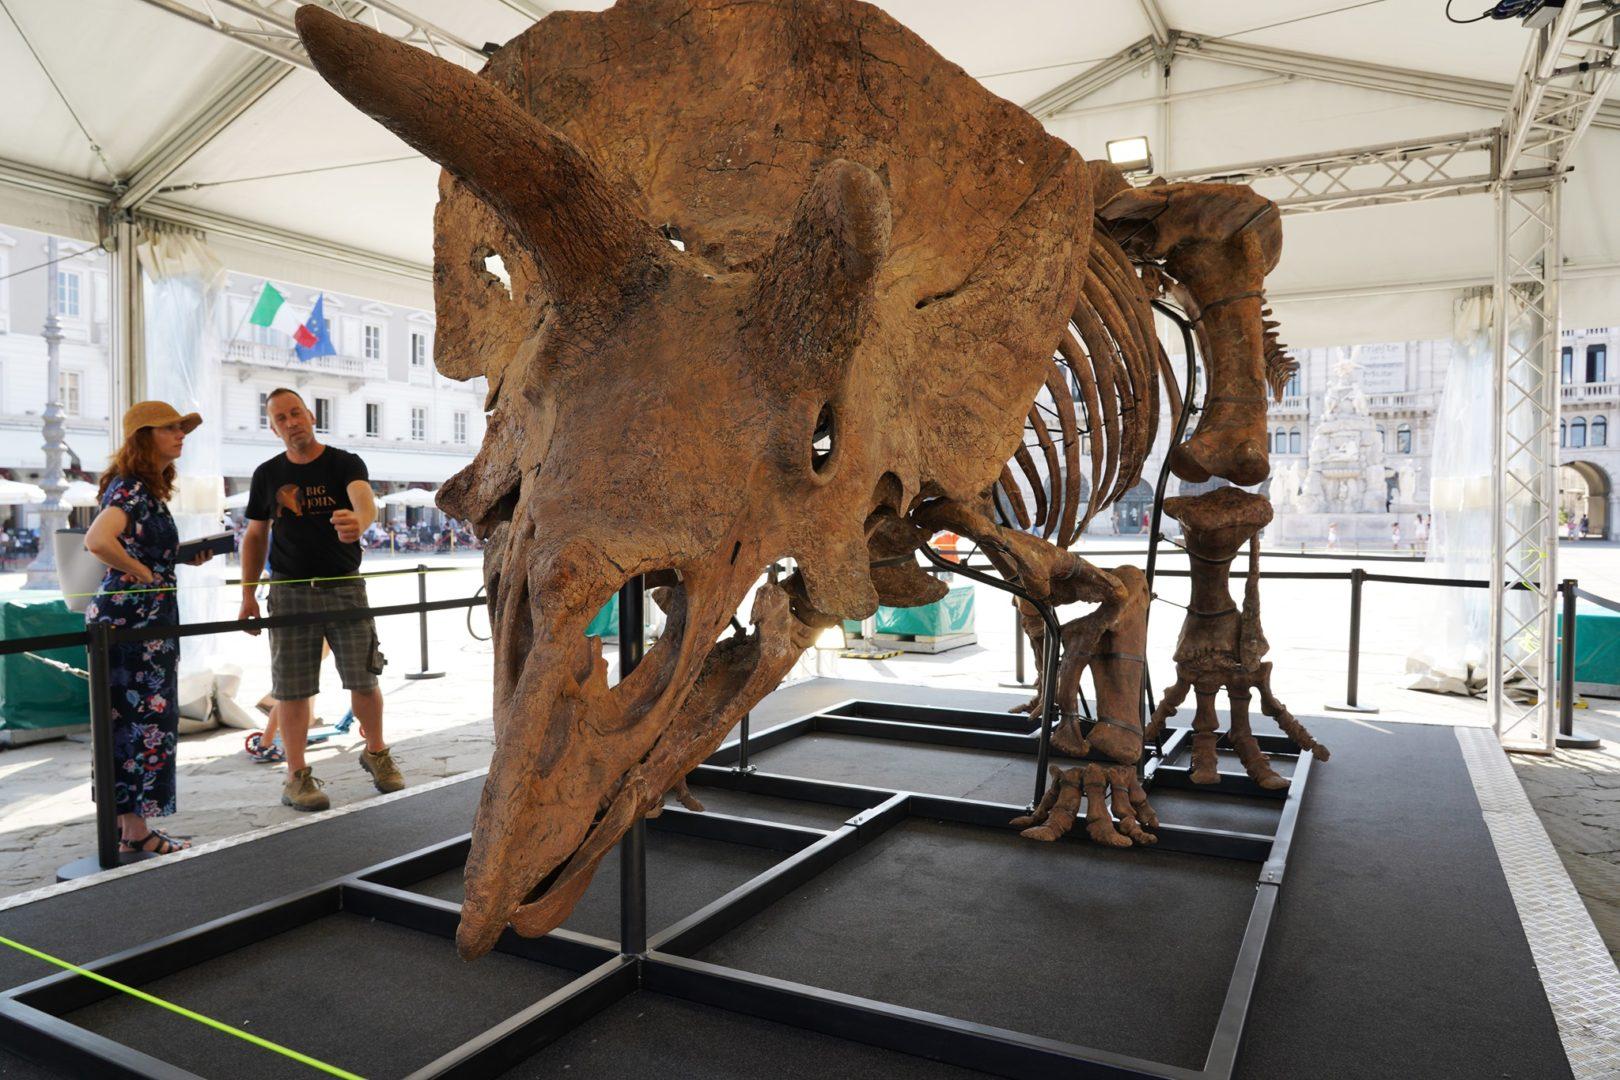 Trieste: Big John entra nel Guinness World Record